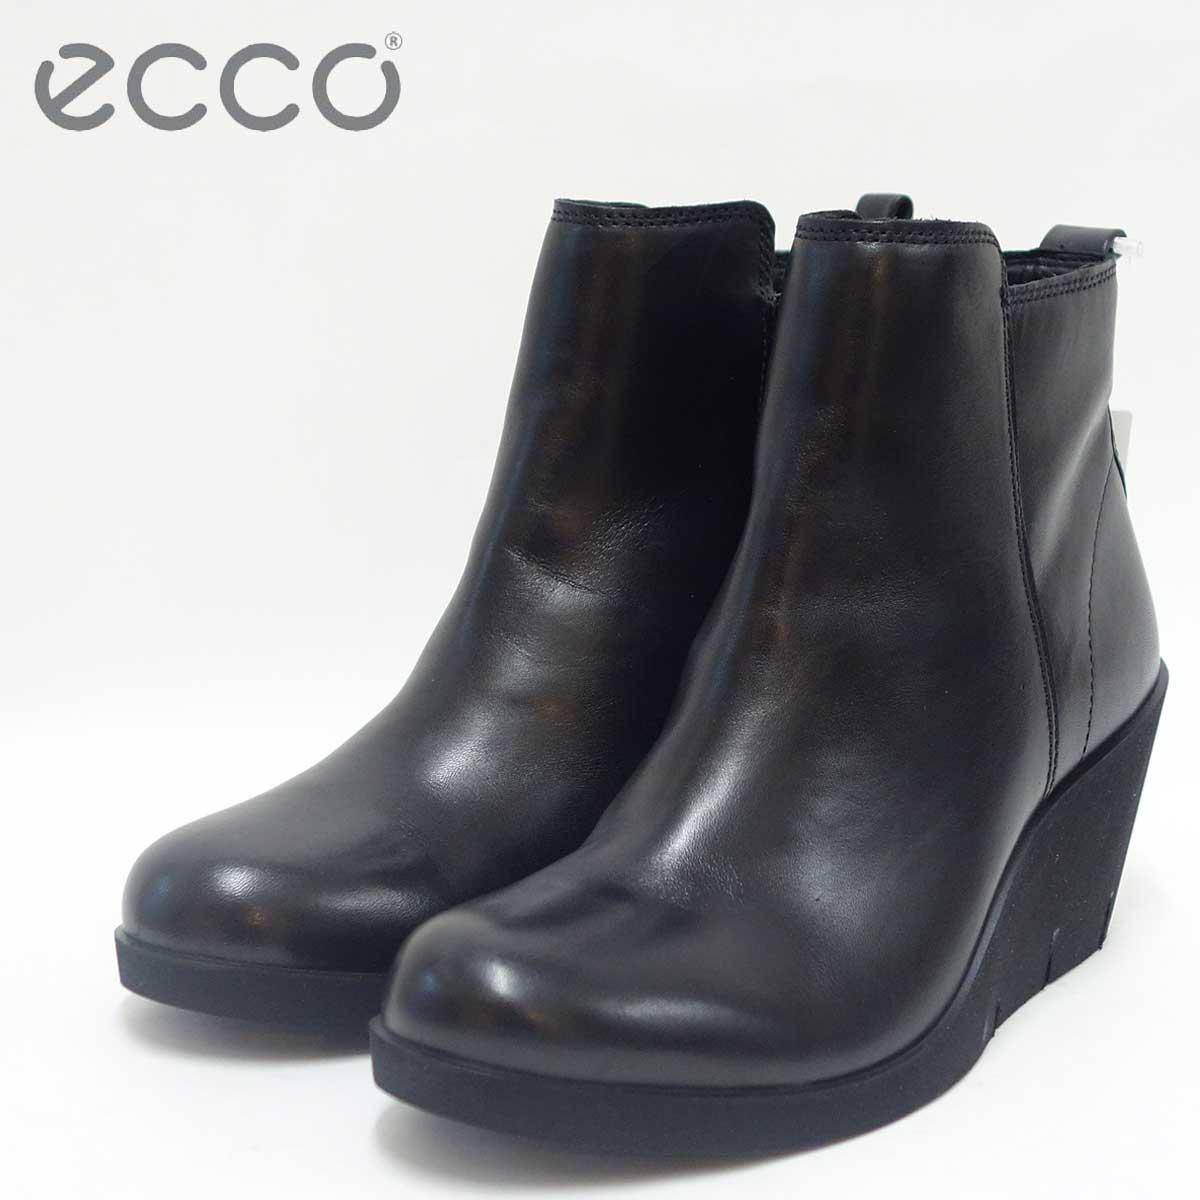 ECCO エコー 282503 ブラック(レディース)スムースレザー ウェッジヒール ショートブーツECCO BELLA WEDGE Low cut zip「靴」